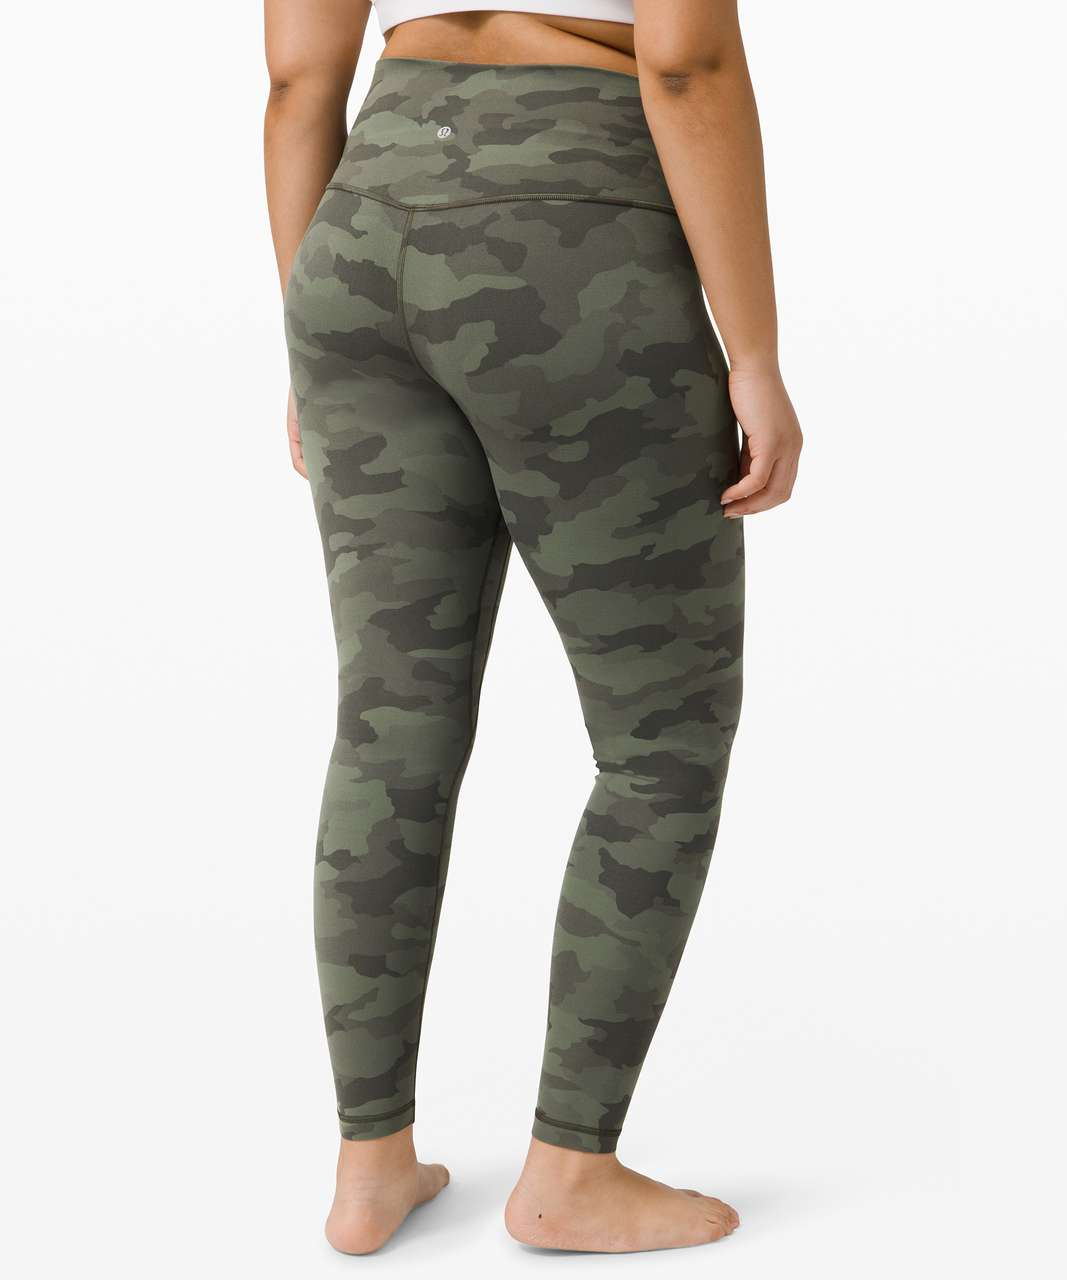 "Lululemon Align Pant 28"" - Heritage 365 Camo Green Twill Multi"